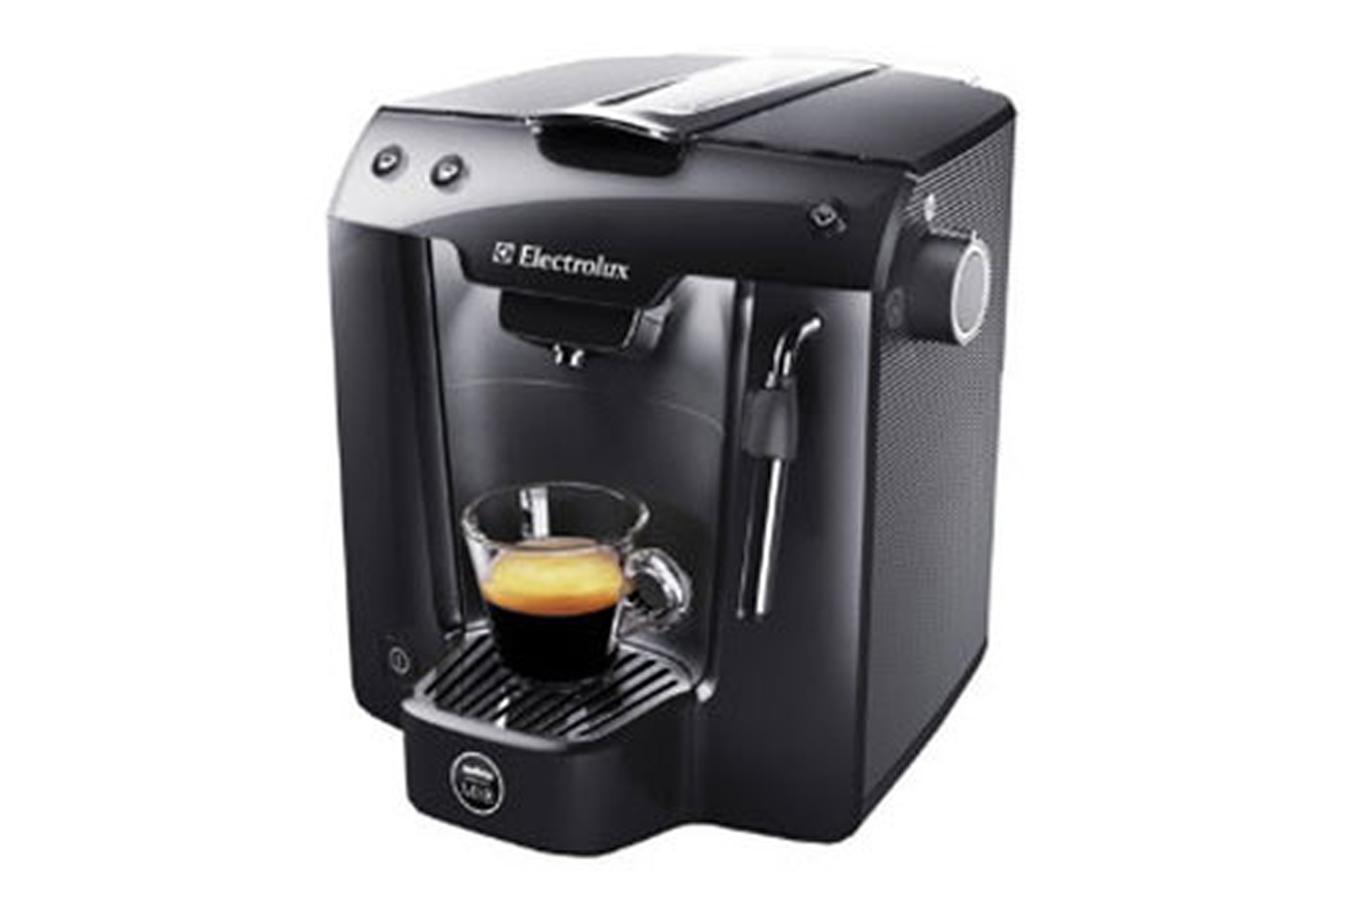 Expresso electrolux elm5200bk favola 3758079 darty - Machine a cafe electrolux ...